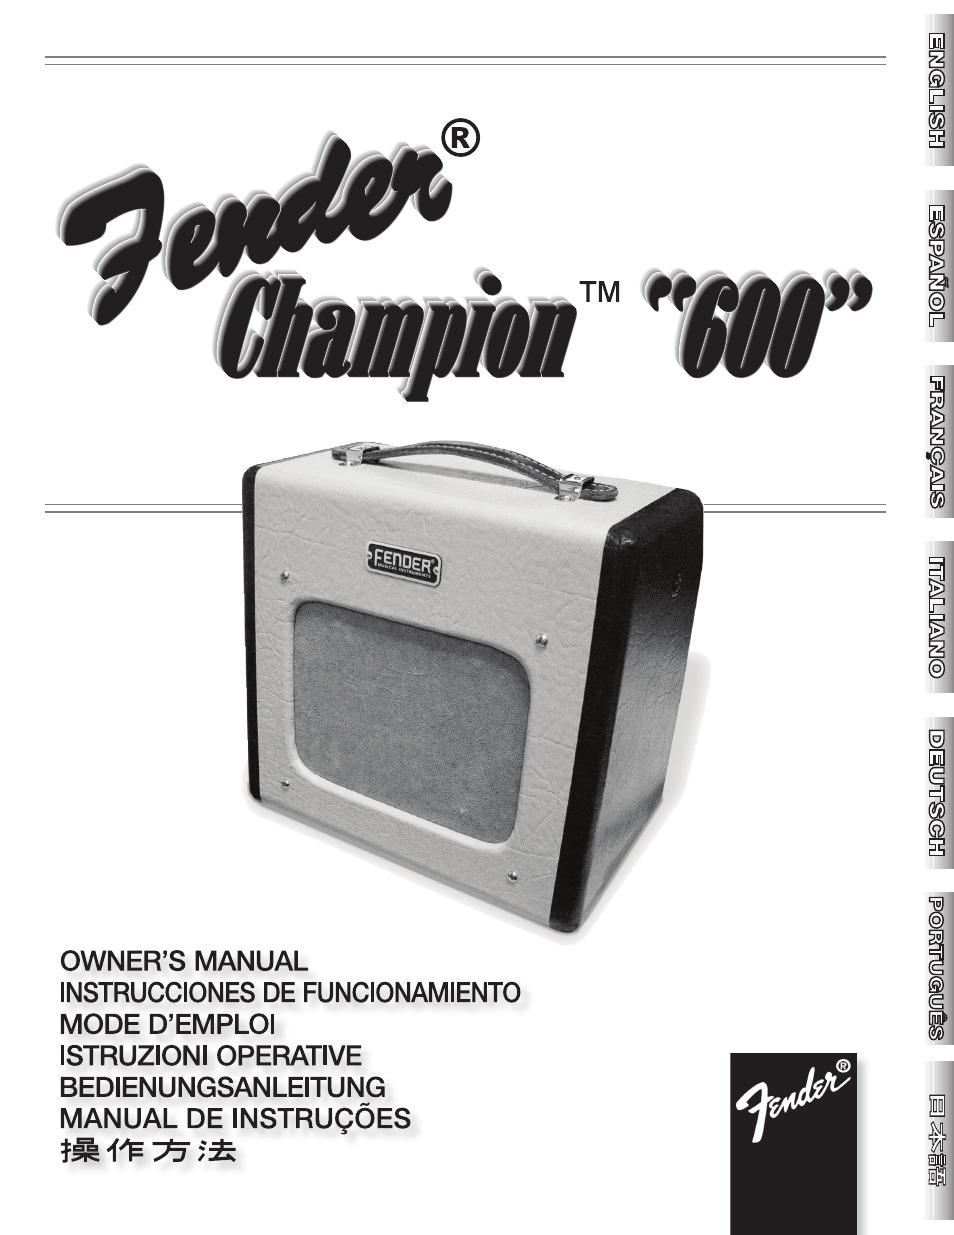 goedkoop outlet winkel verkoop sportschoenen Pdf Download   Fender Champion 600 User Manual (20 pages)